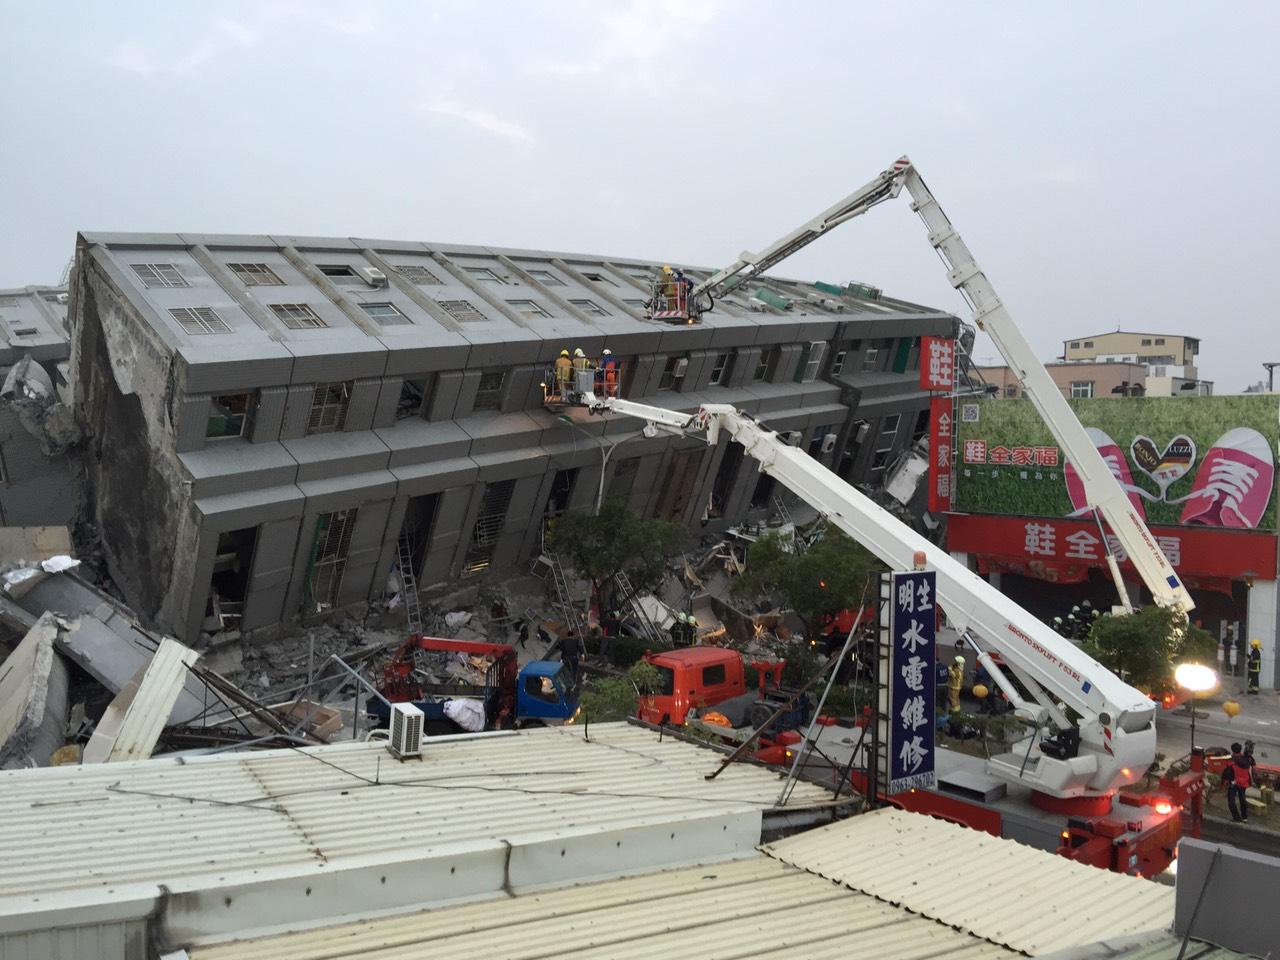 iphone5卡槽上没有序列号地震重创台南116死各地灾情彙整即时更新[影] | 重点新闻| 中央社即时汽車線上考試